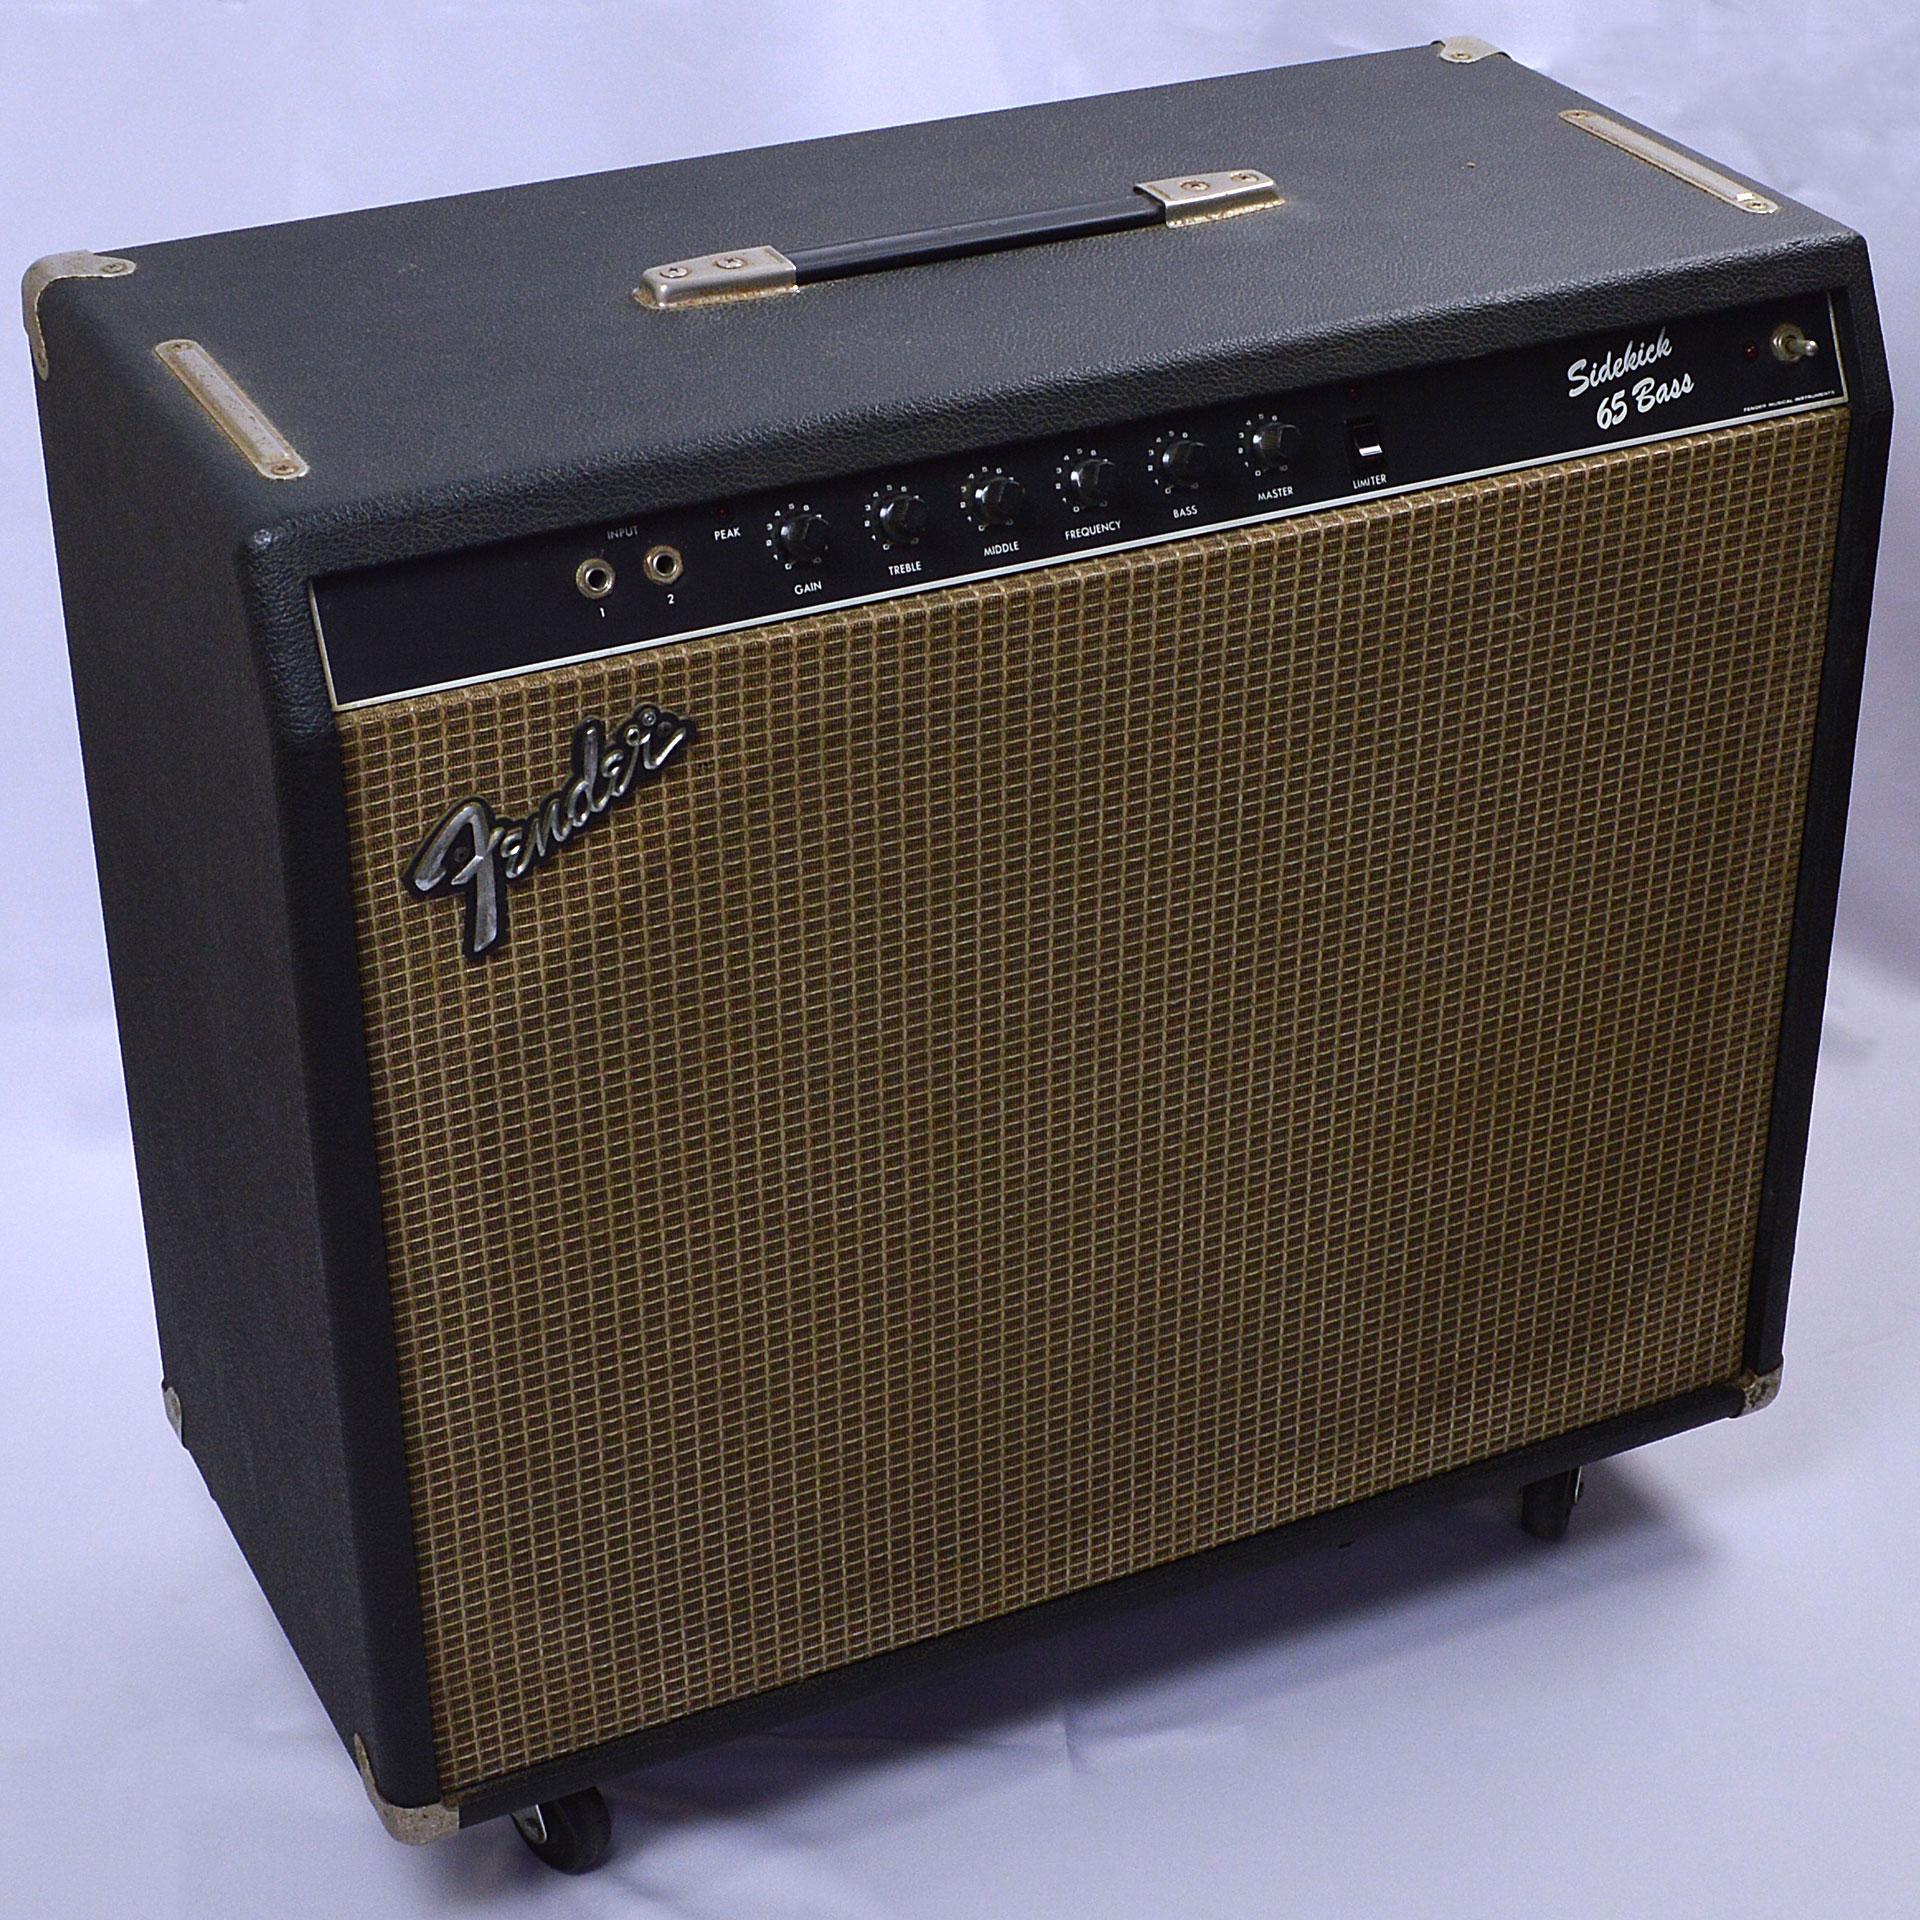 Fender 【中古】Sidekick 65 Bassサムネ画像